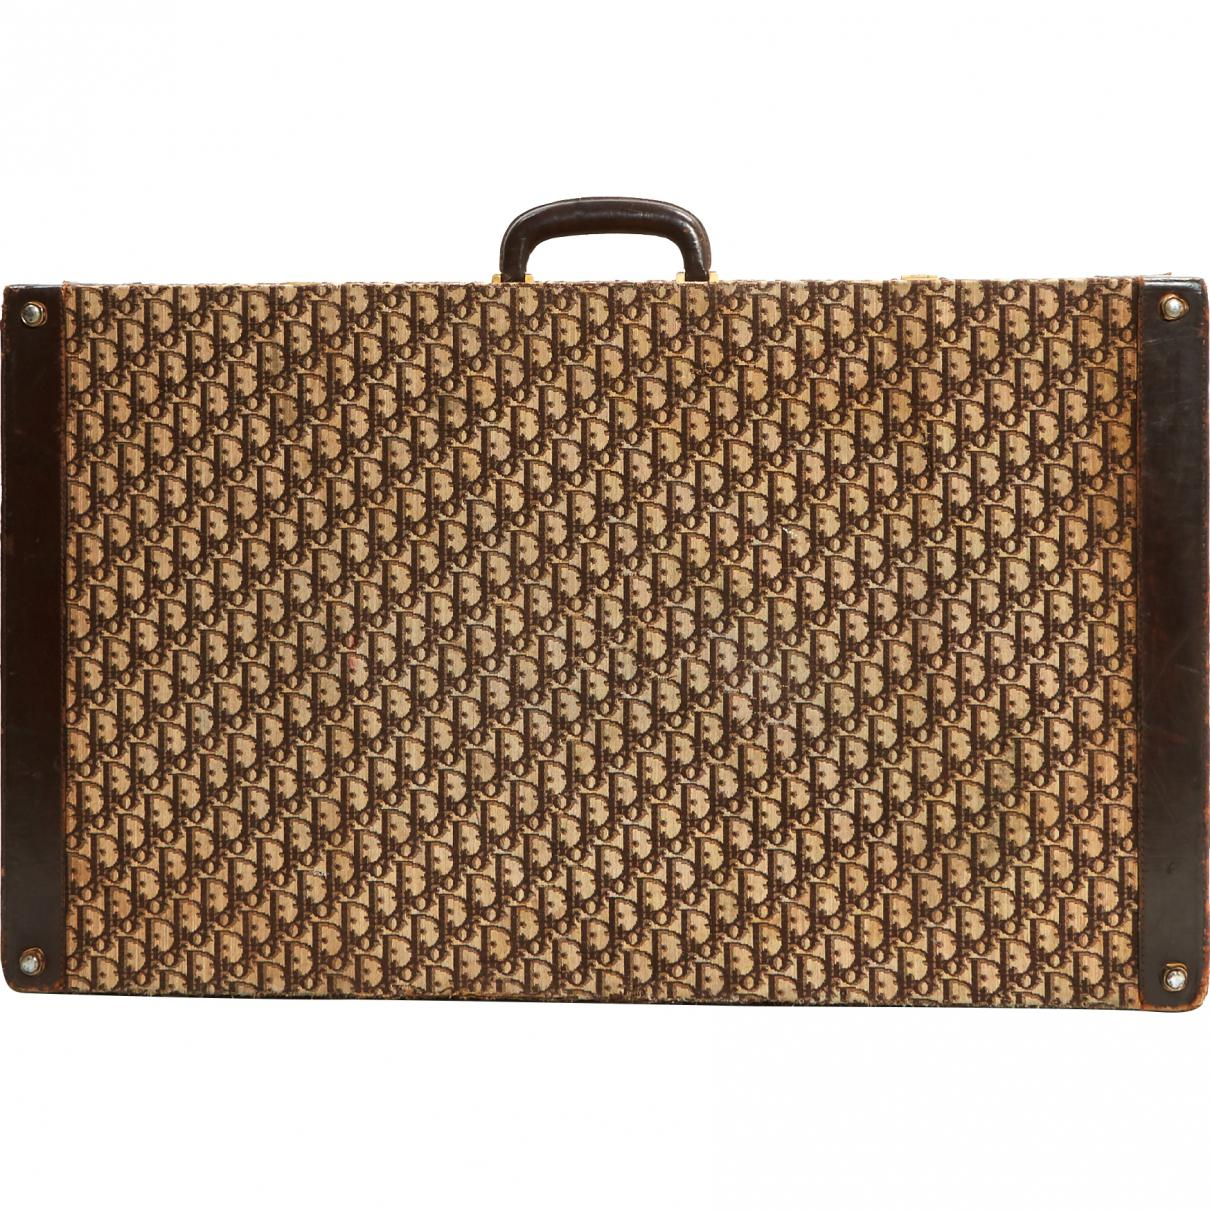 Dior Pre-owned - Cloth travel bag 4emleYvGU